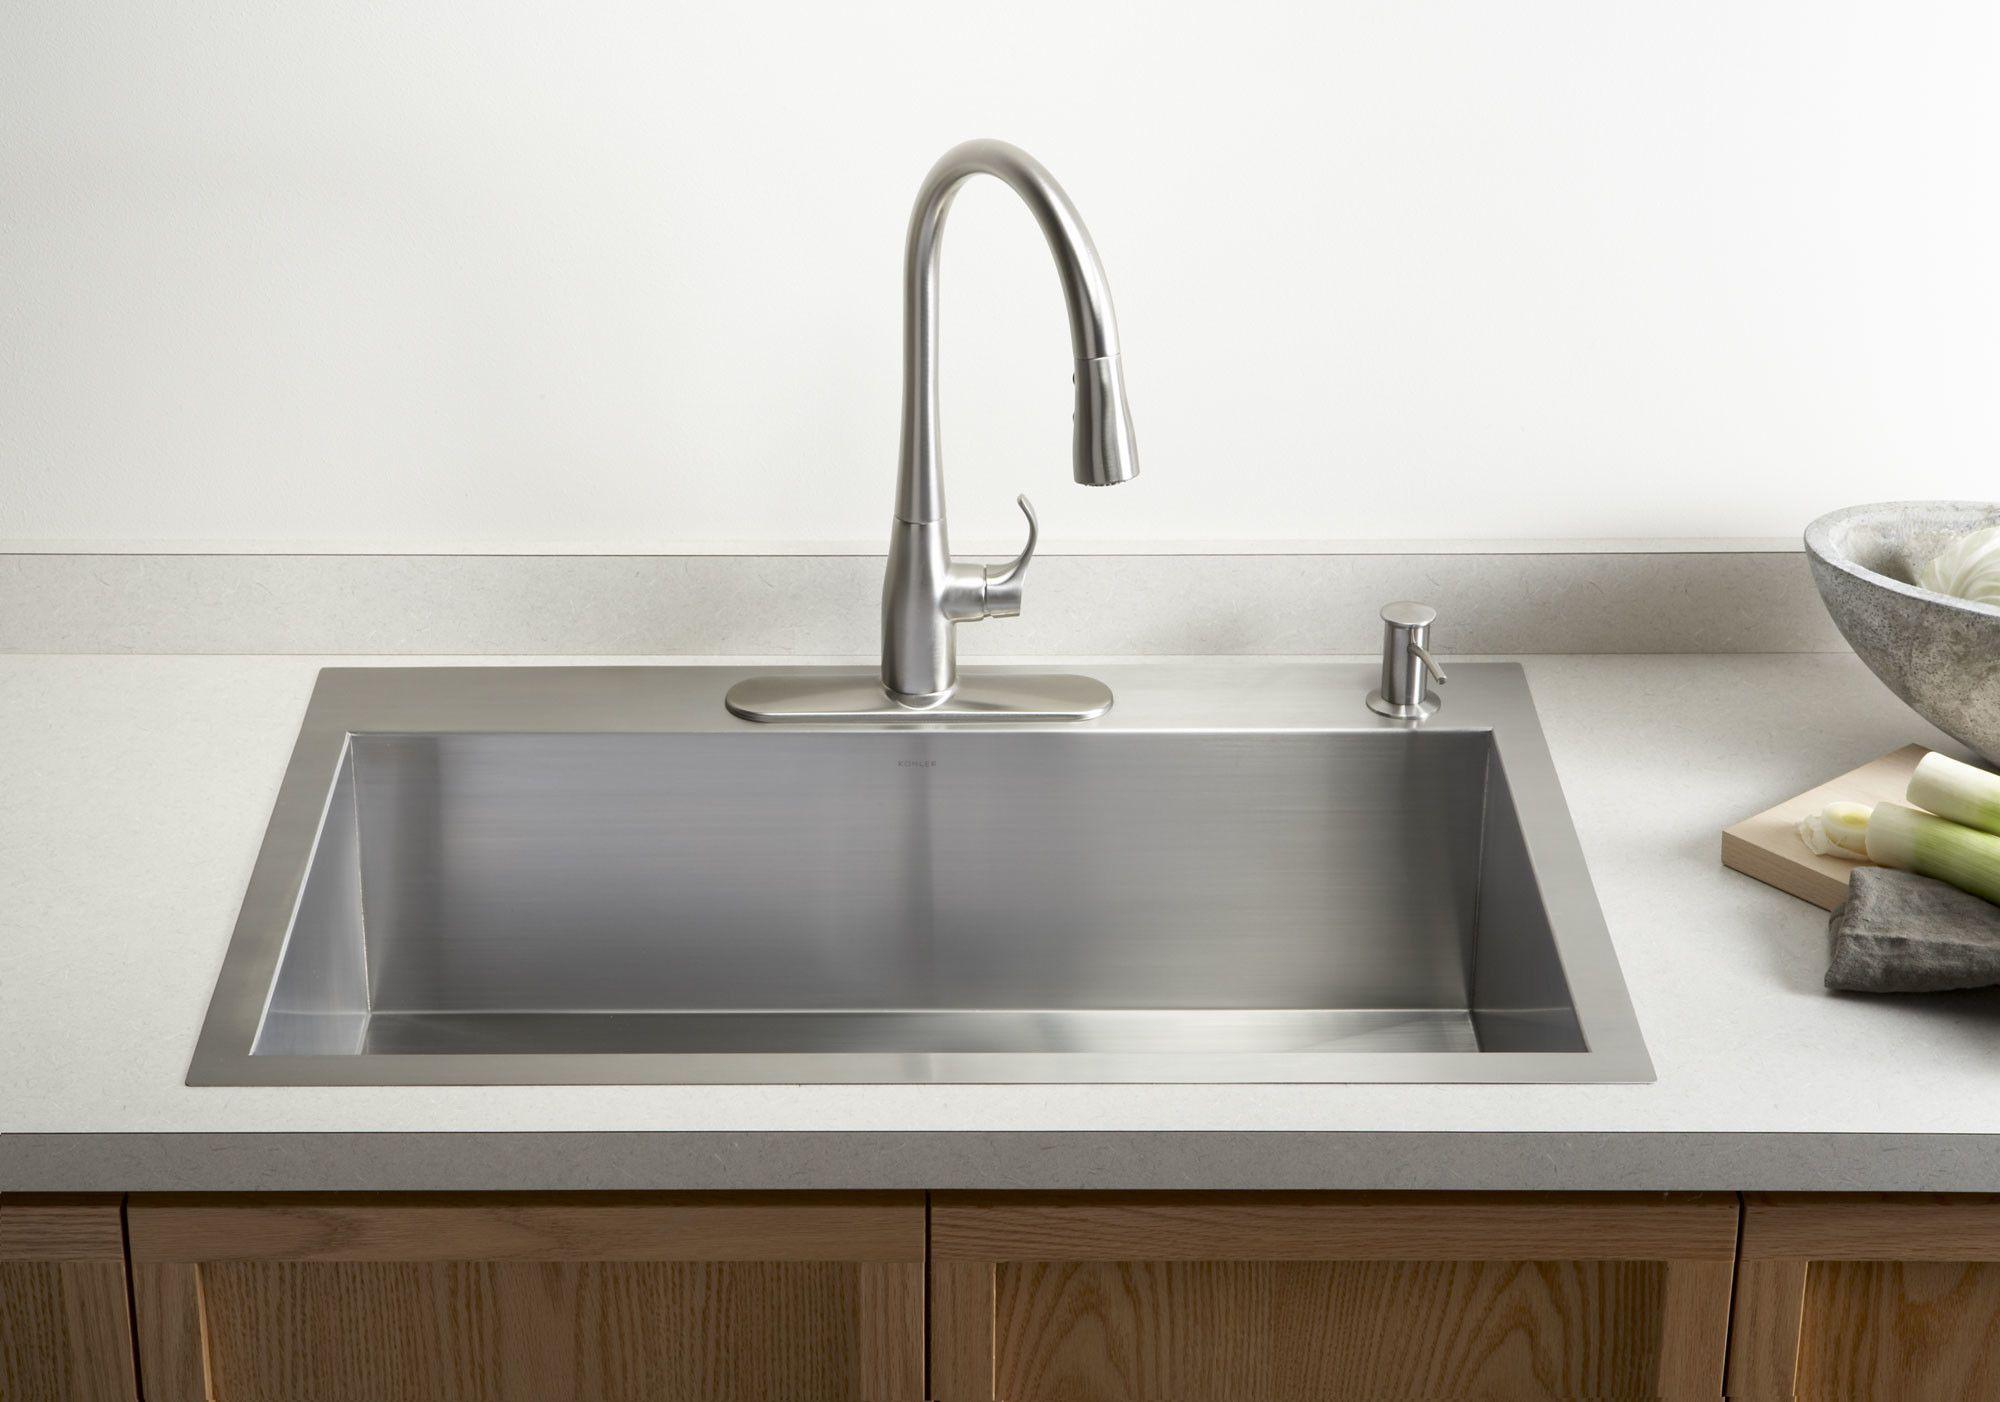 Vault 33 L X 22 W X 9 5 16 Top Mount Under Mount Large Single Bowl Kitchen Sink With Single Faucet Hole Best Kitchen Sinks Single Bowl Kitchen Sink Undermount Kitchen Sinks